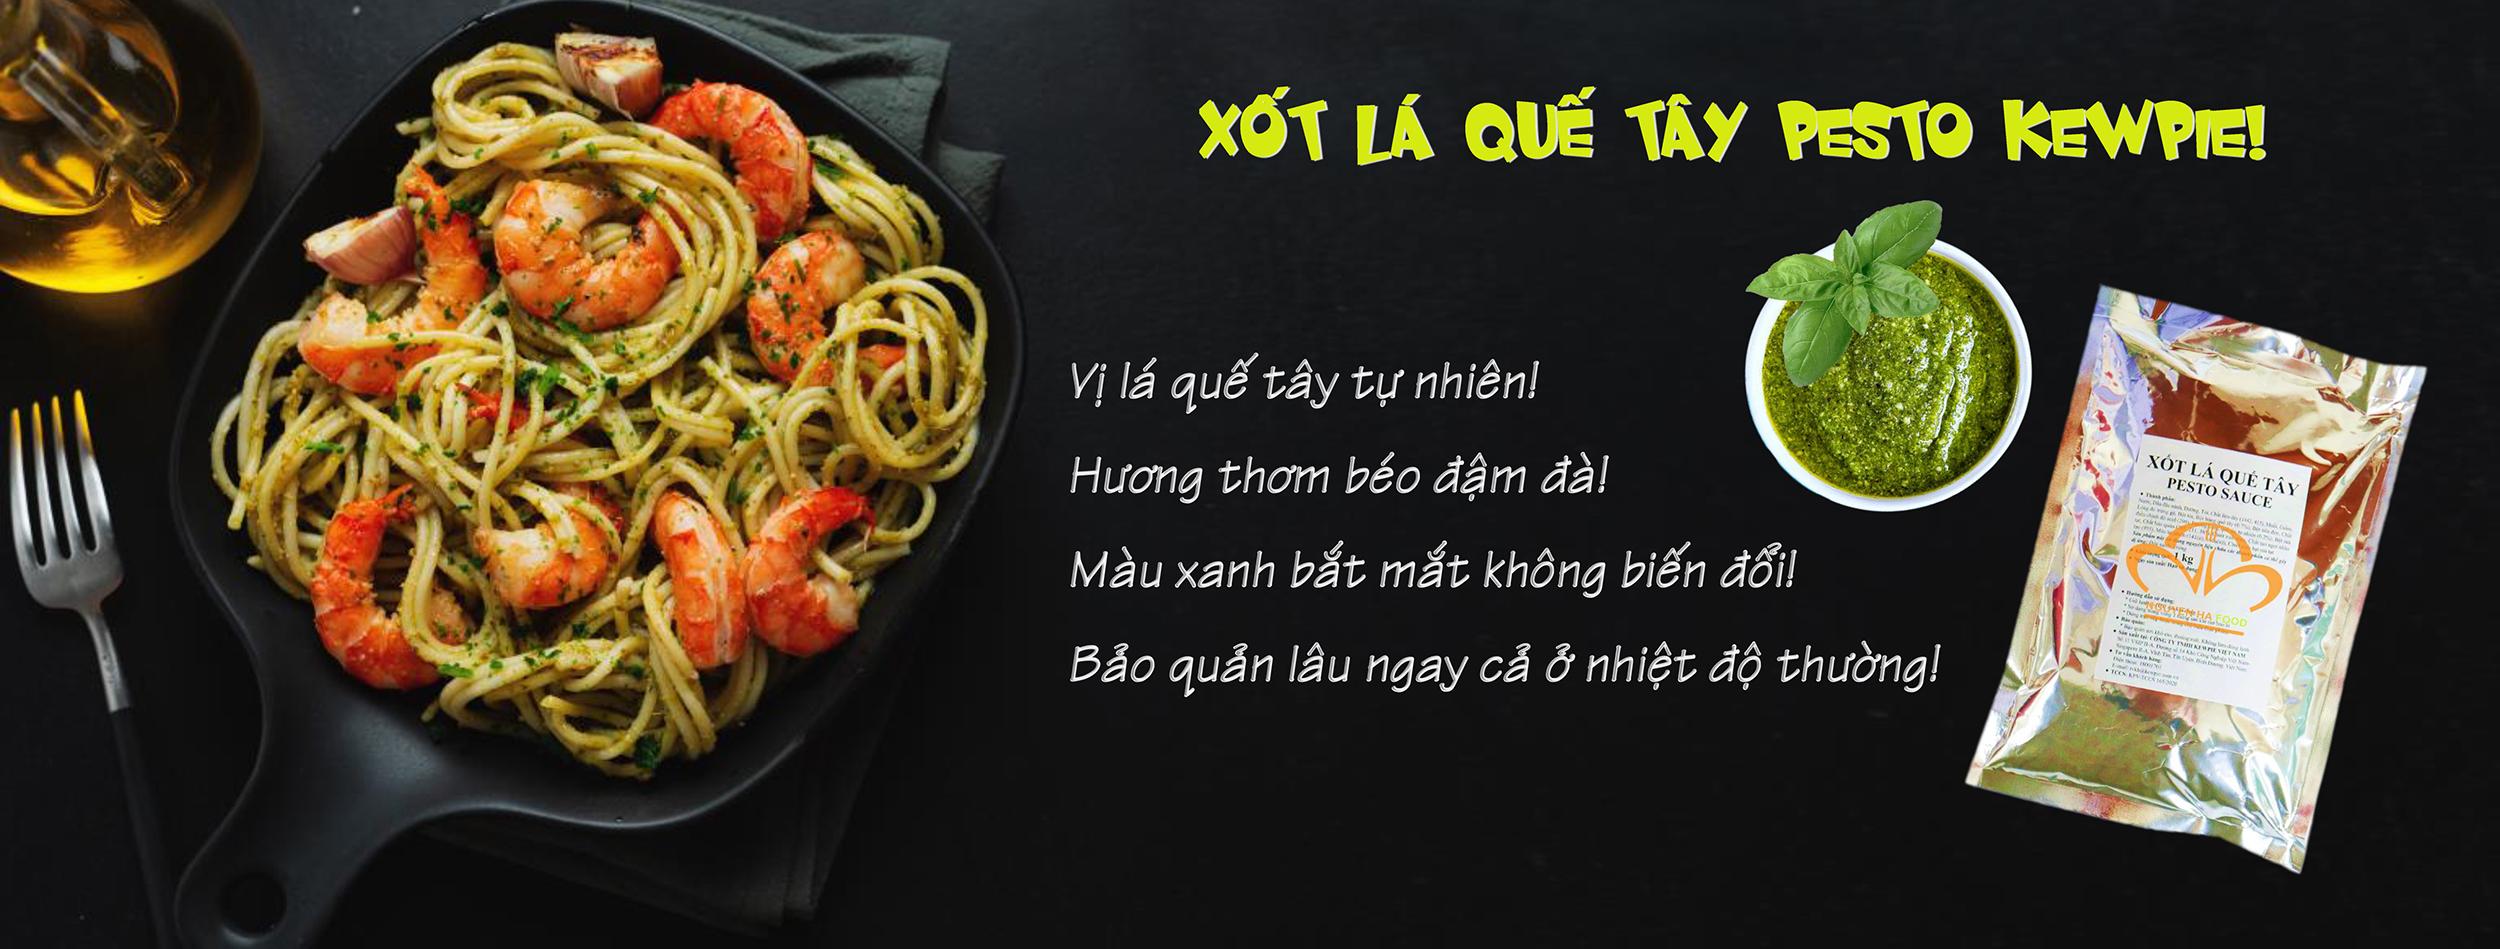 XOT PESTO LA QUE TAY KEWPIE - NGUYEN HA FOOD